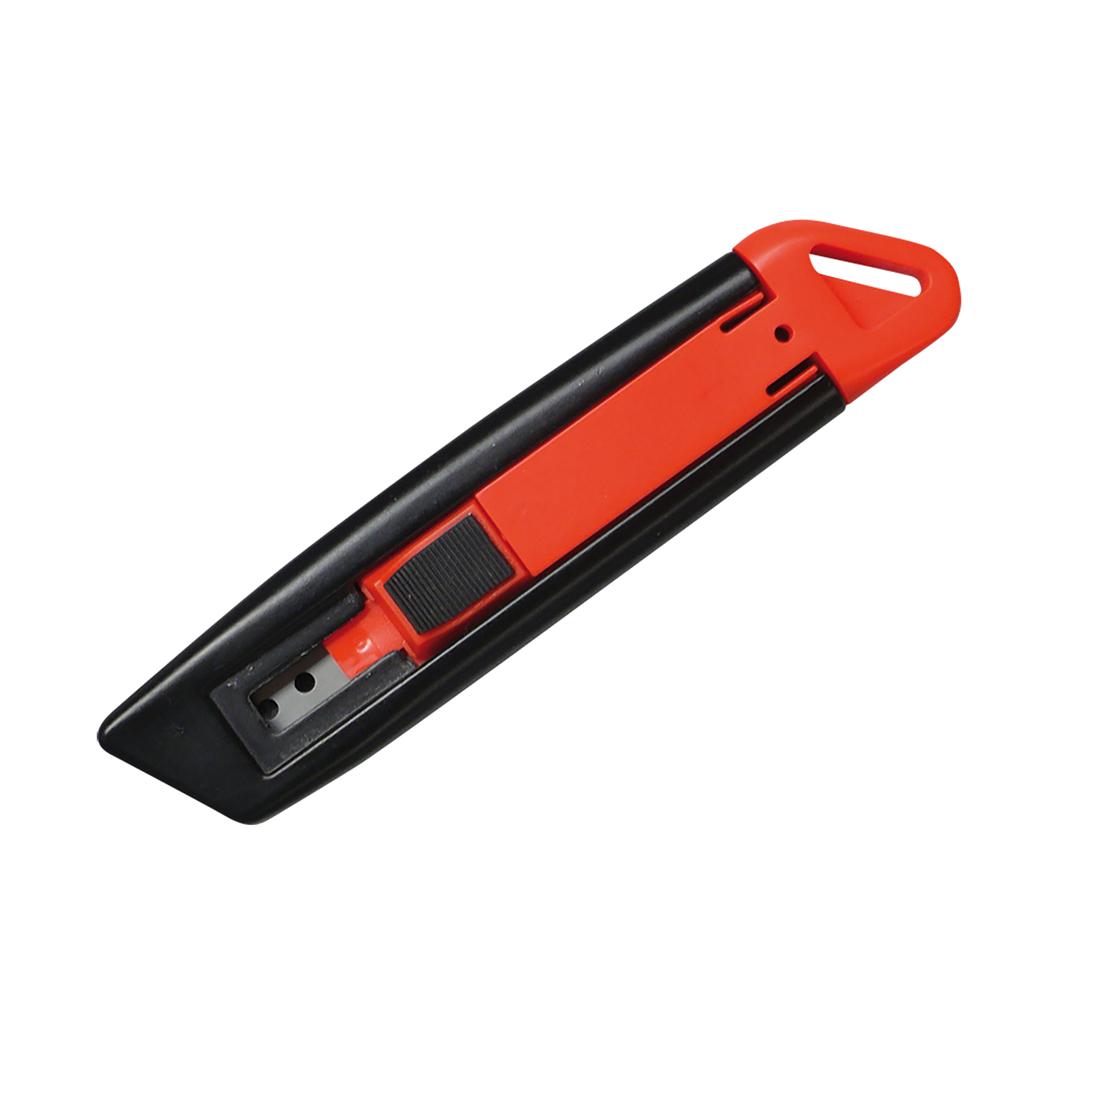 Portwest Ultra Safety Cutter - KN10